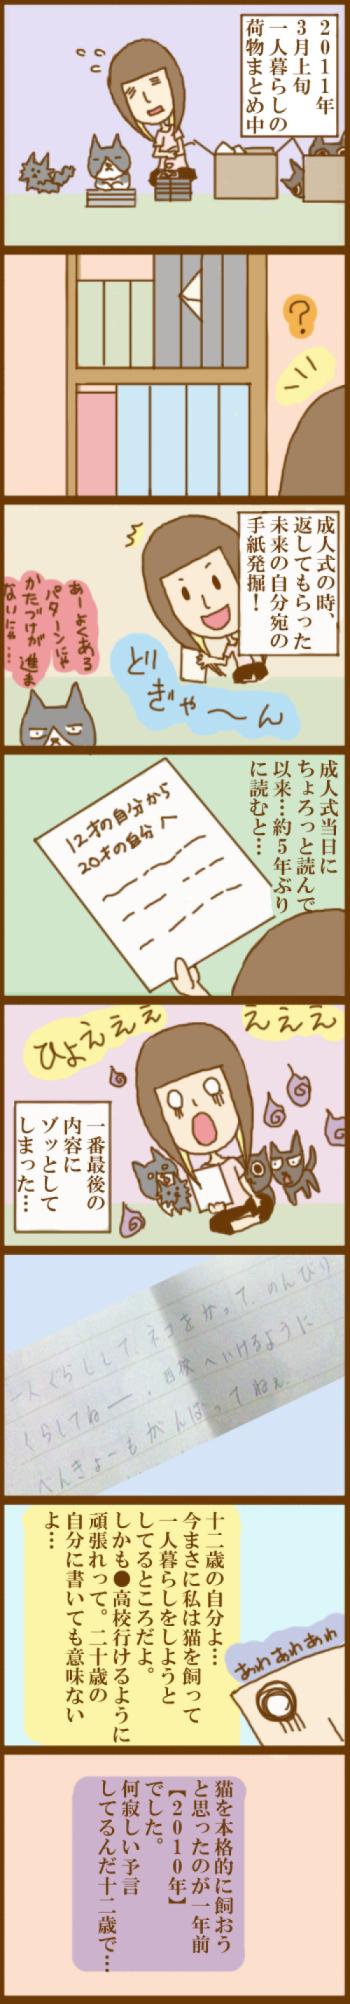 f:id:suzuokayu:20201123104343j:plain